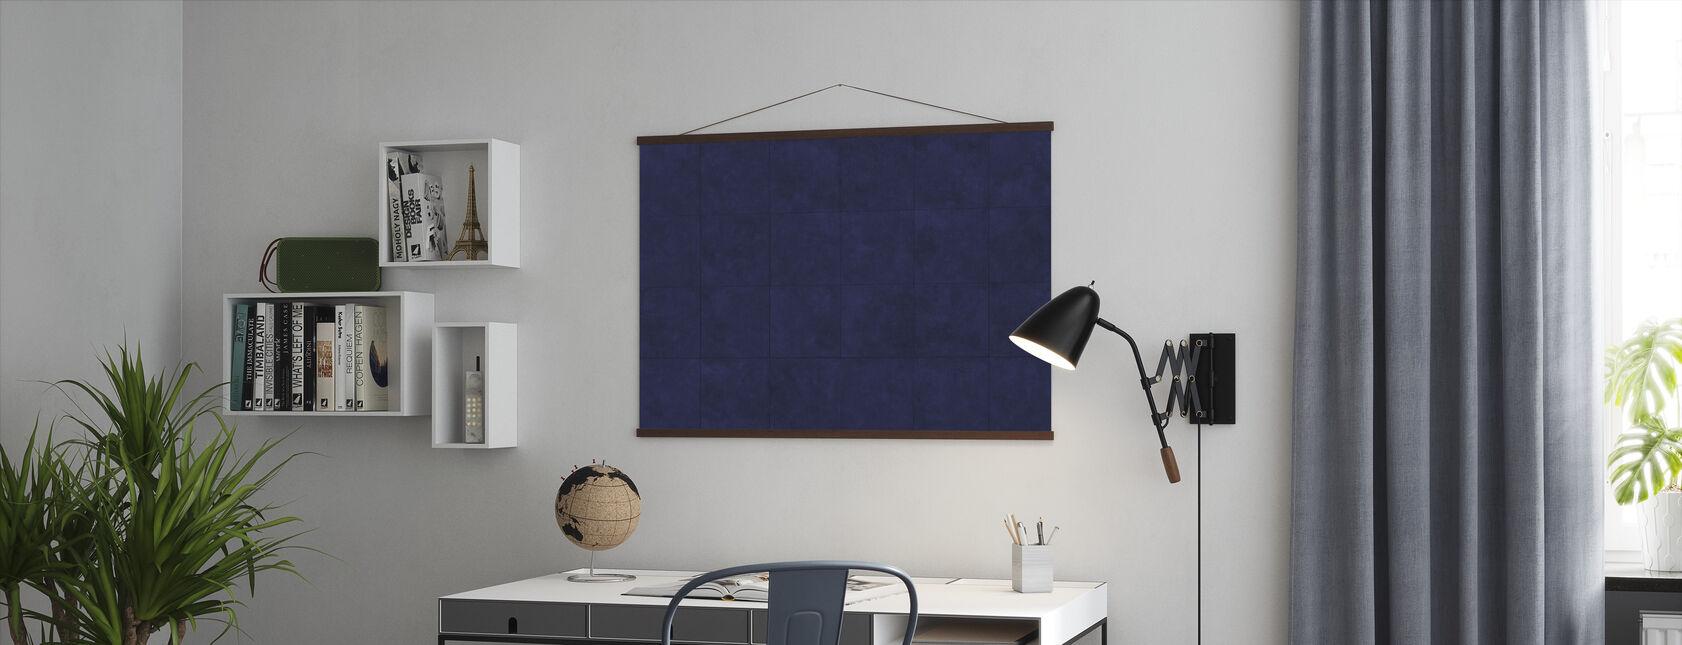 Kupferplatten - Blau - Poster - Büro